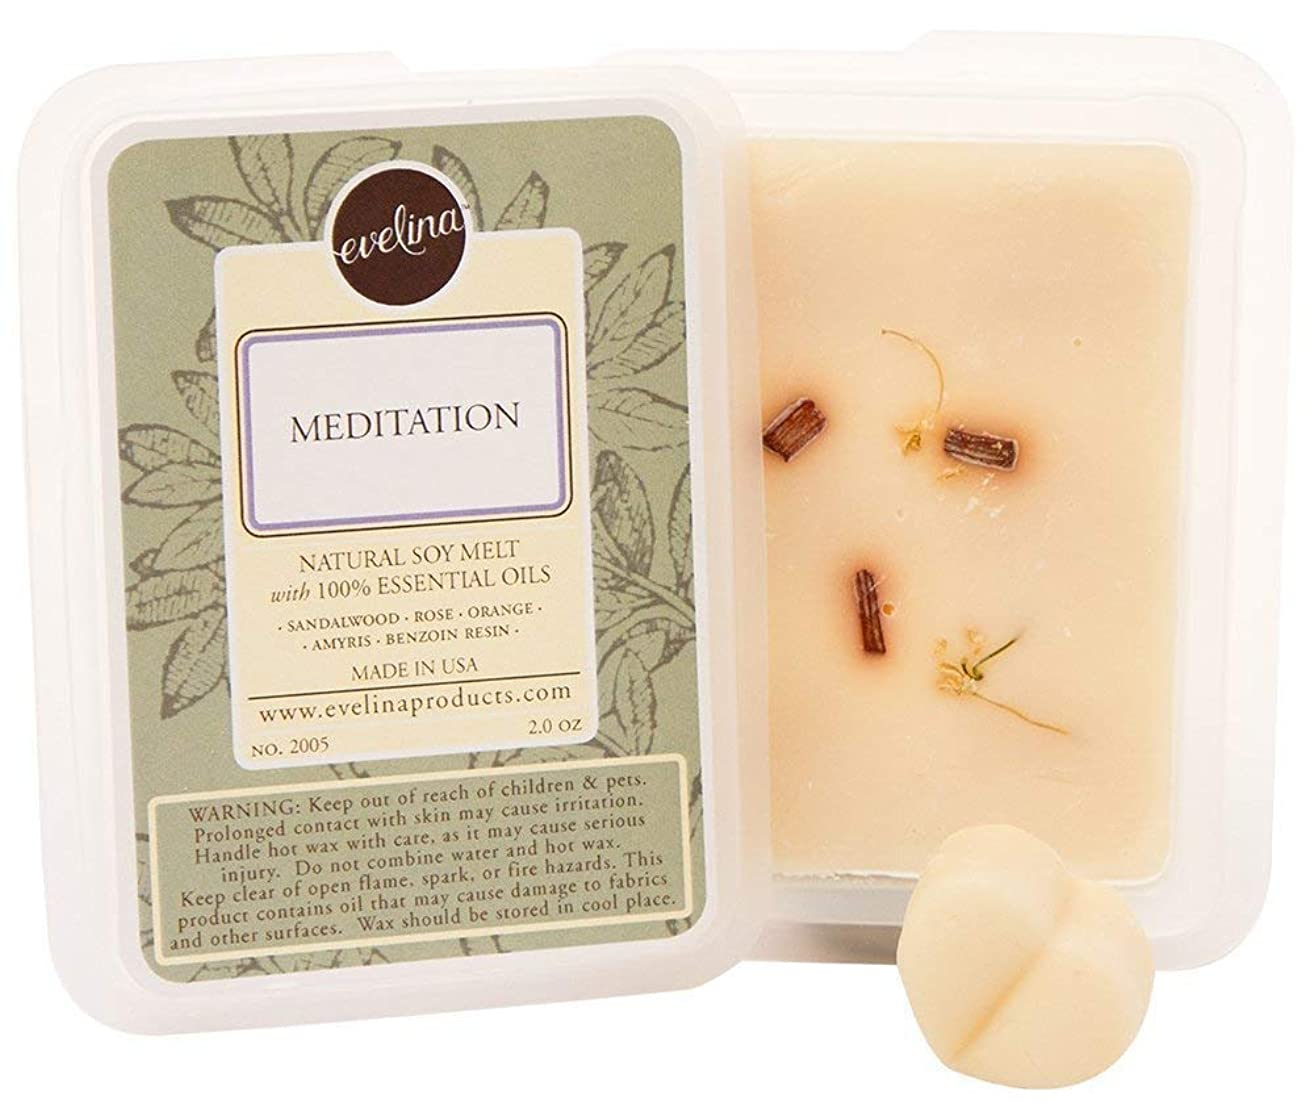 EVELINA Essential Oil Aromatherapy Scent Melts (Meditation)